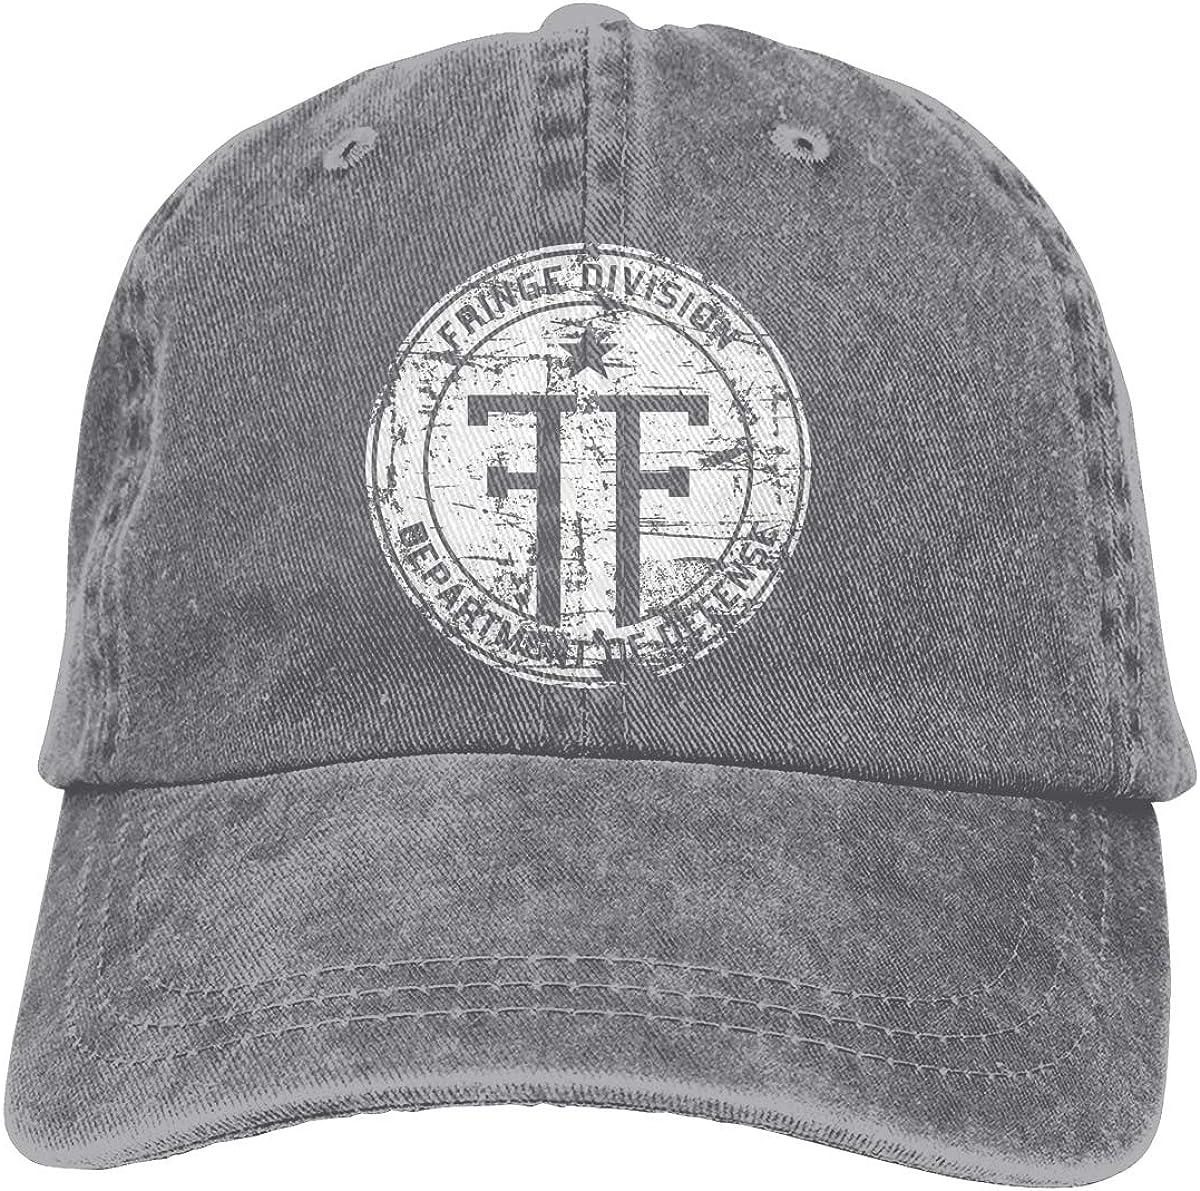 TBVS 77 Men Women Washed Yarn-Dyed Denim Baseball Cap Fringe Division Plain Cap